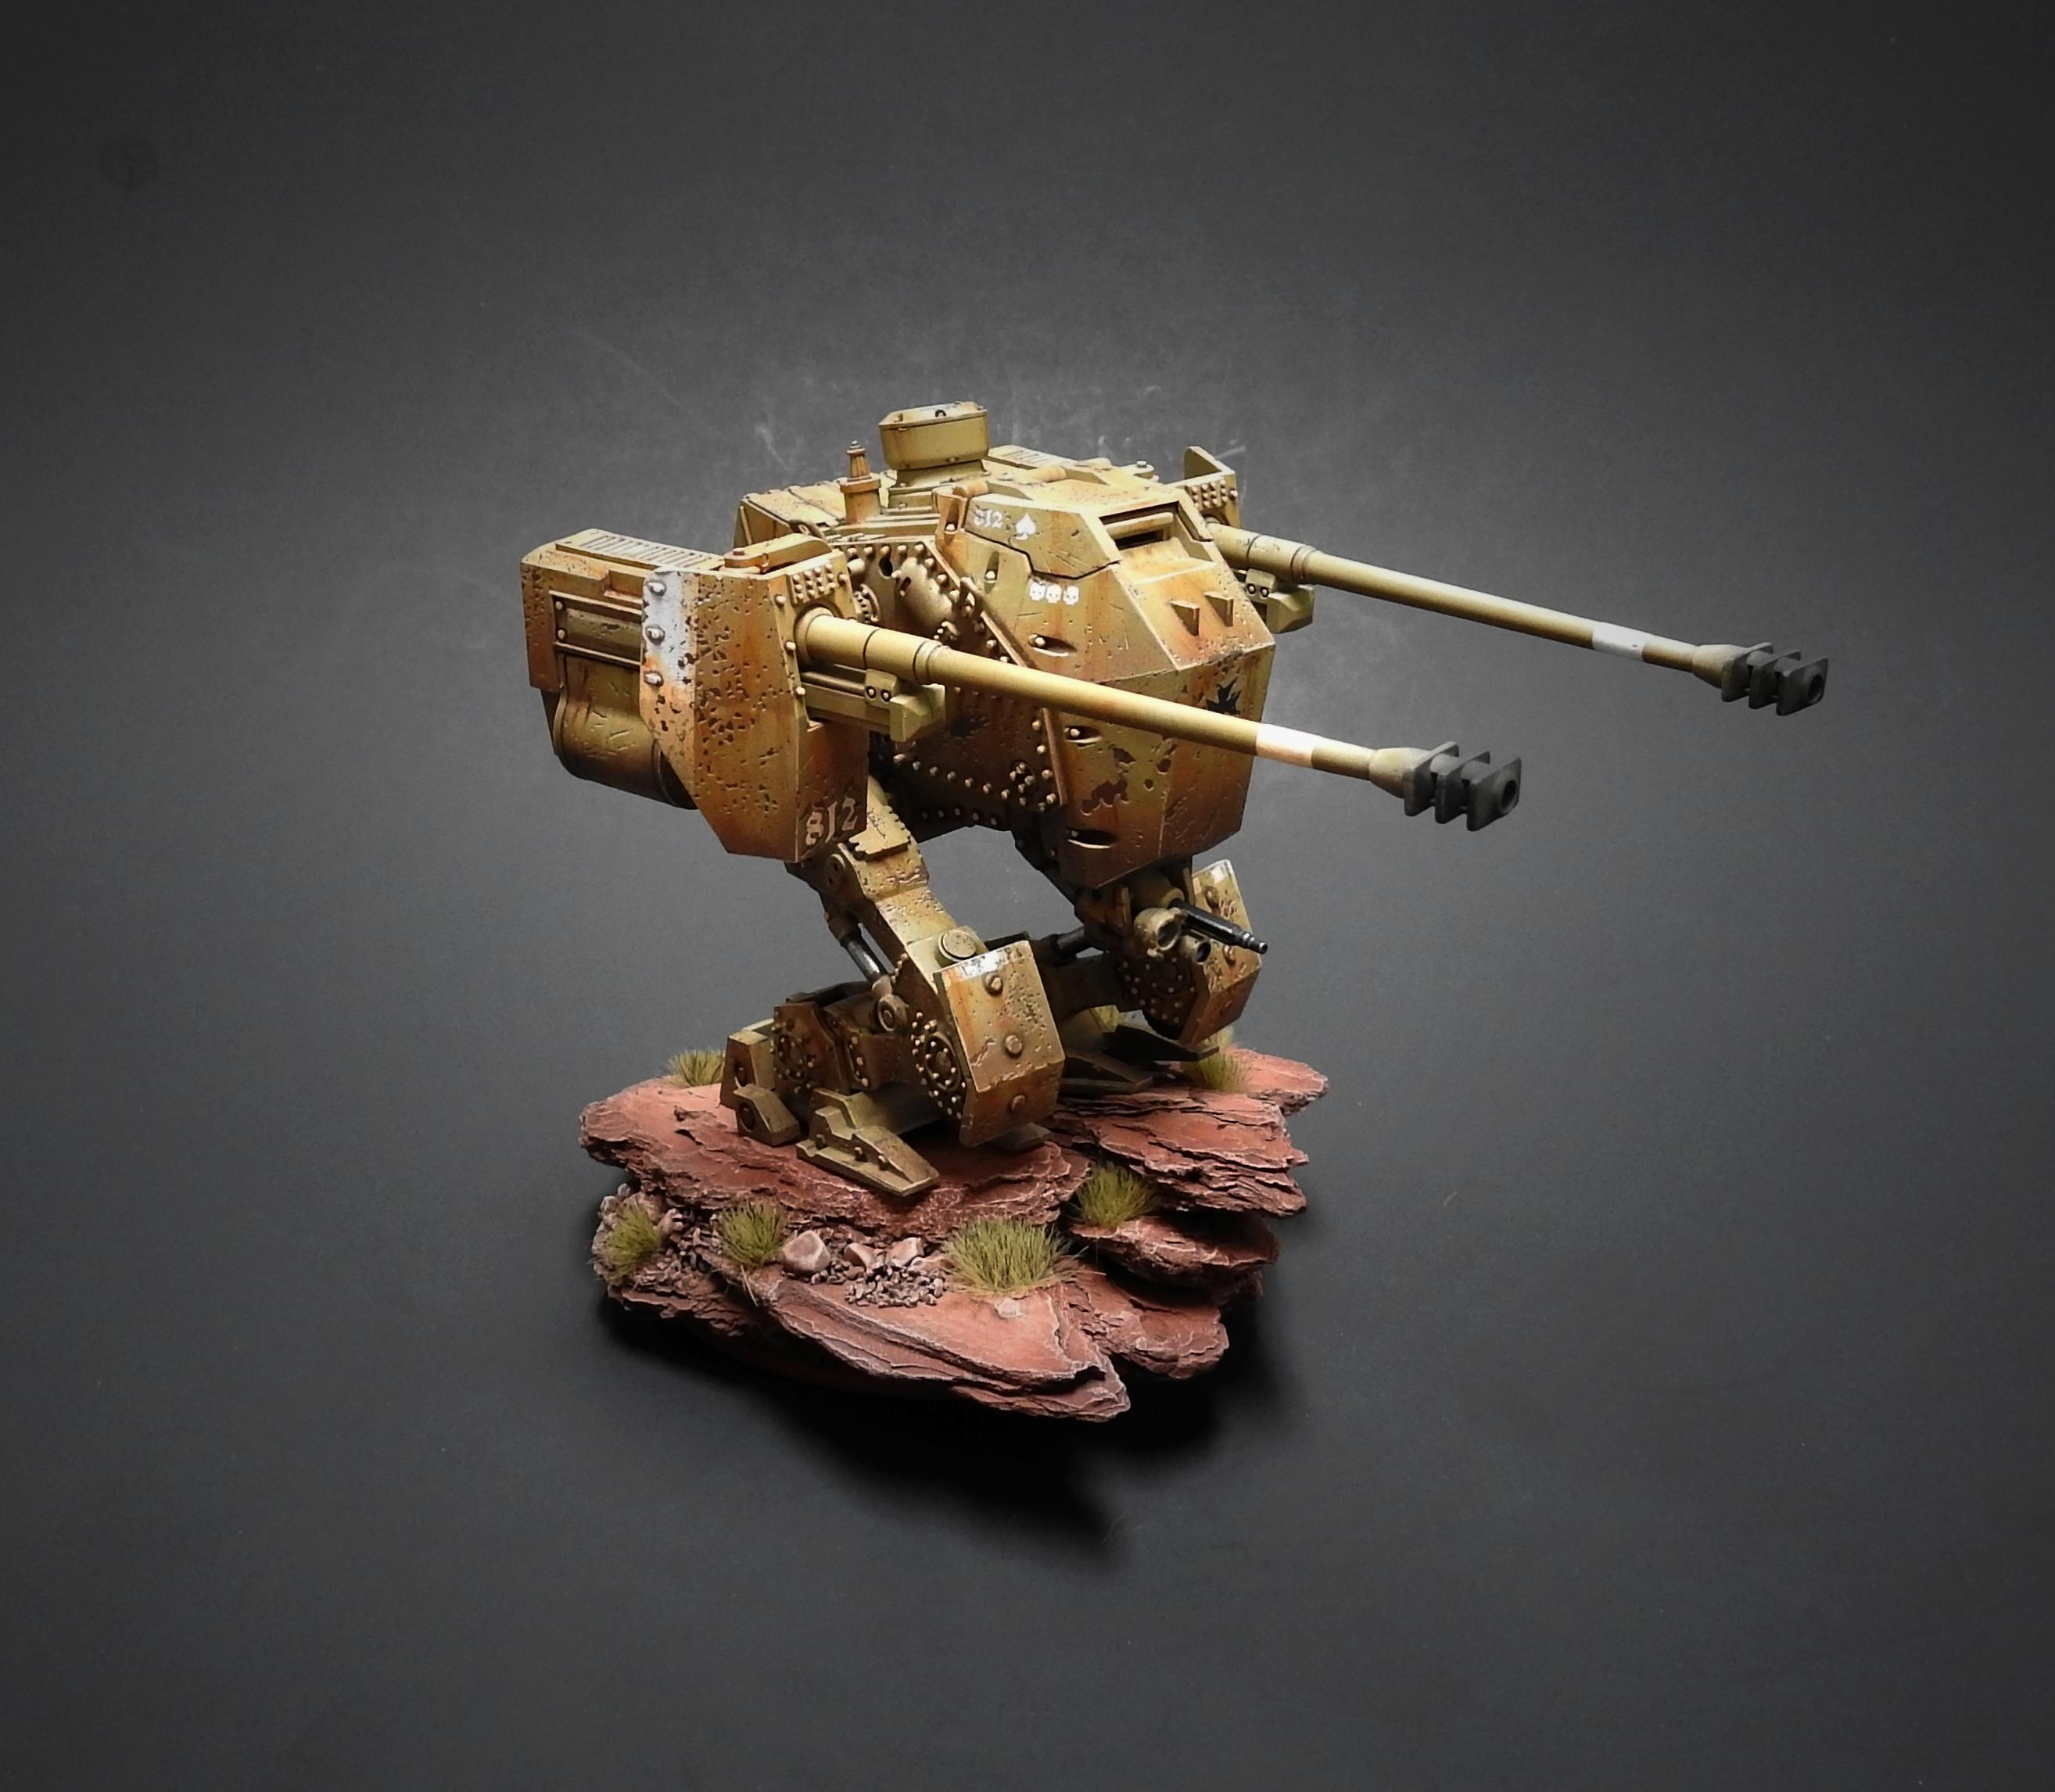 Airbrush, Axis, Dust, Dust Tactics, Painting, Tank, Vehicle, Walkers, Weathered, Weird War Ii, World War 2